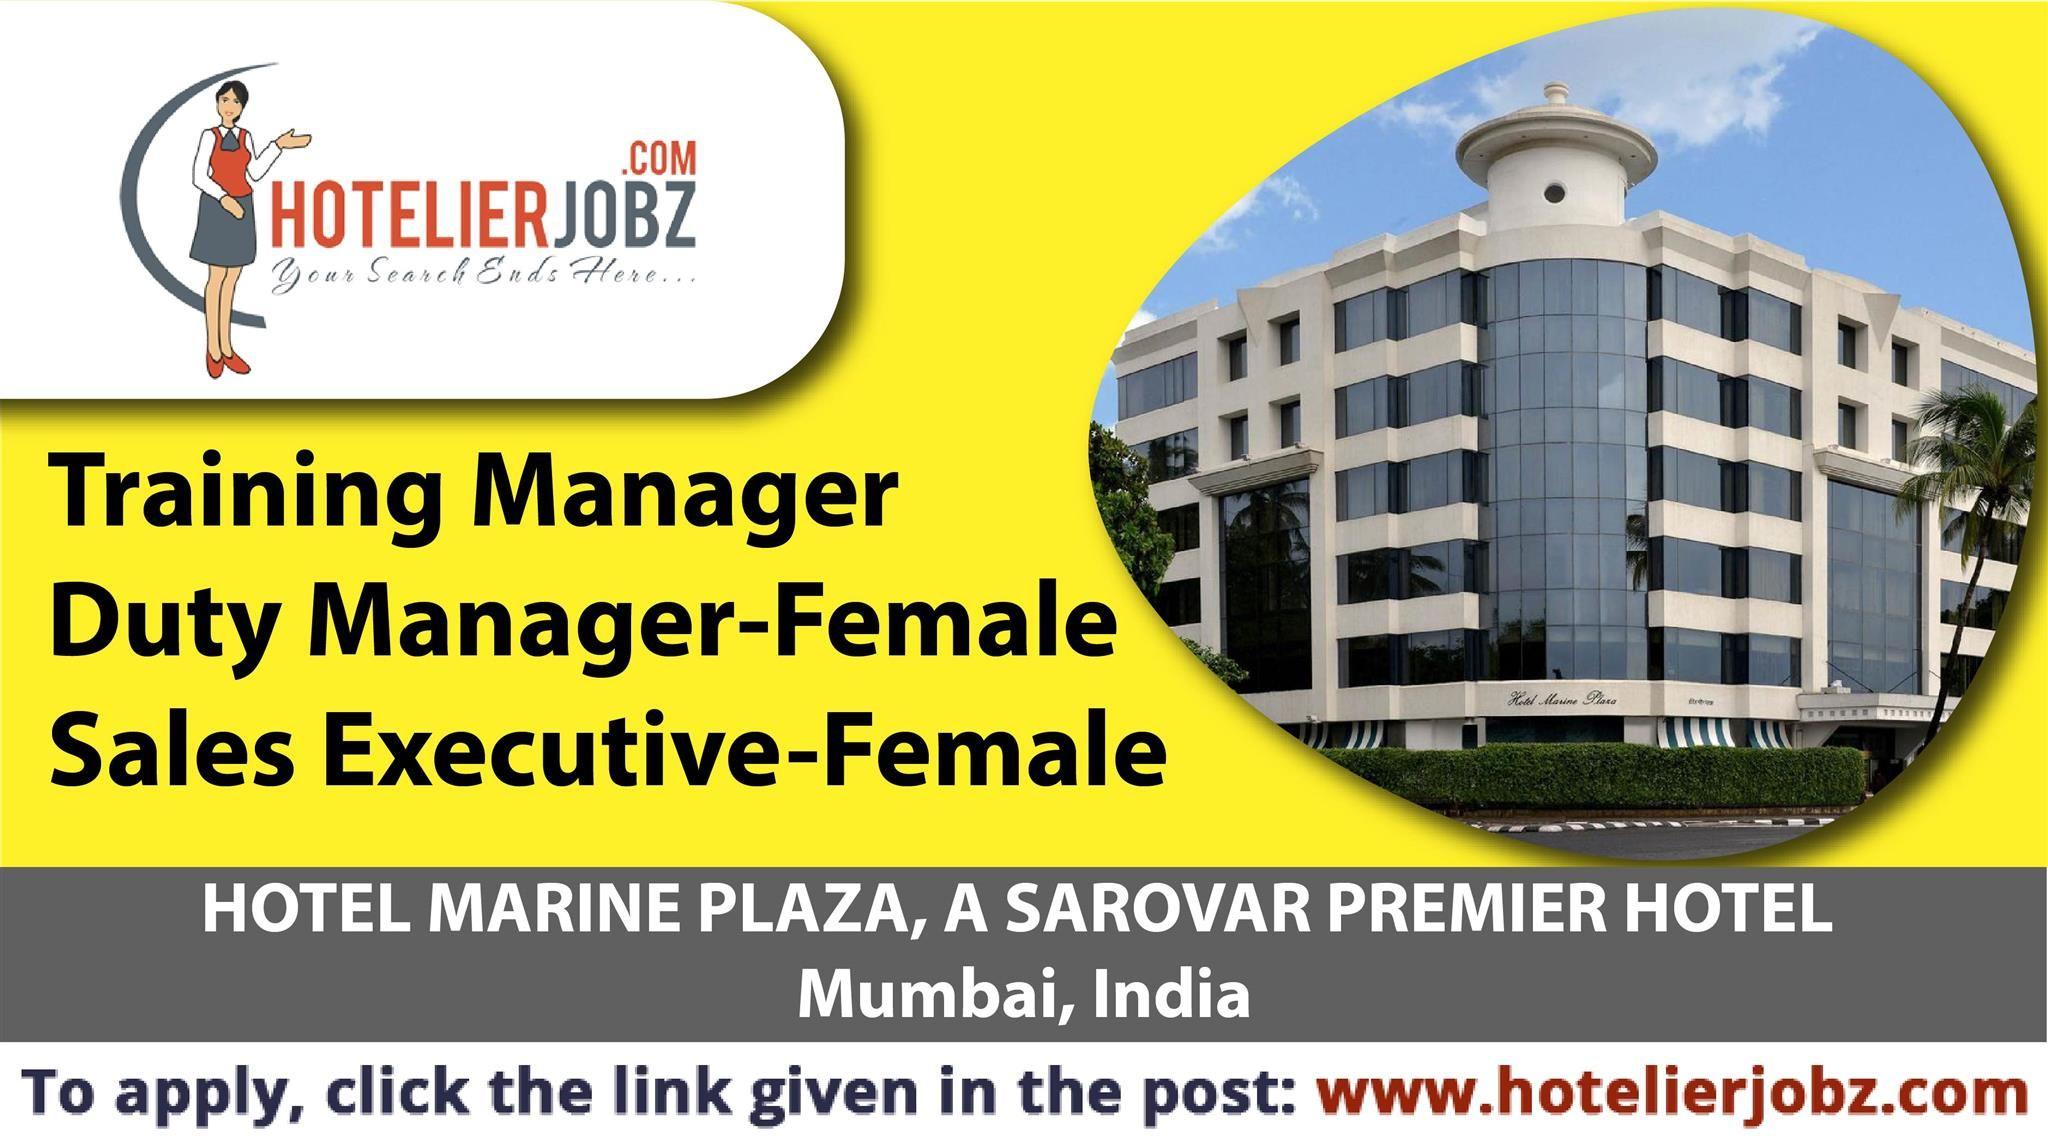 Hotel Marine Plaza, a Sarovar Premier Hotel, Mumbai, India